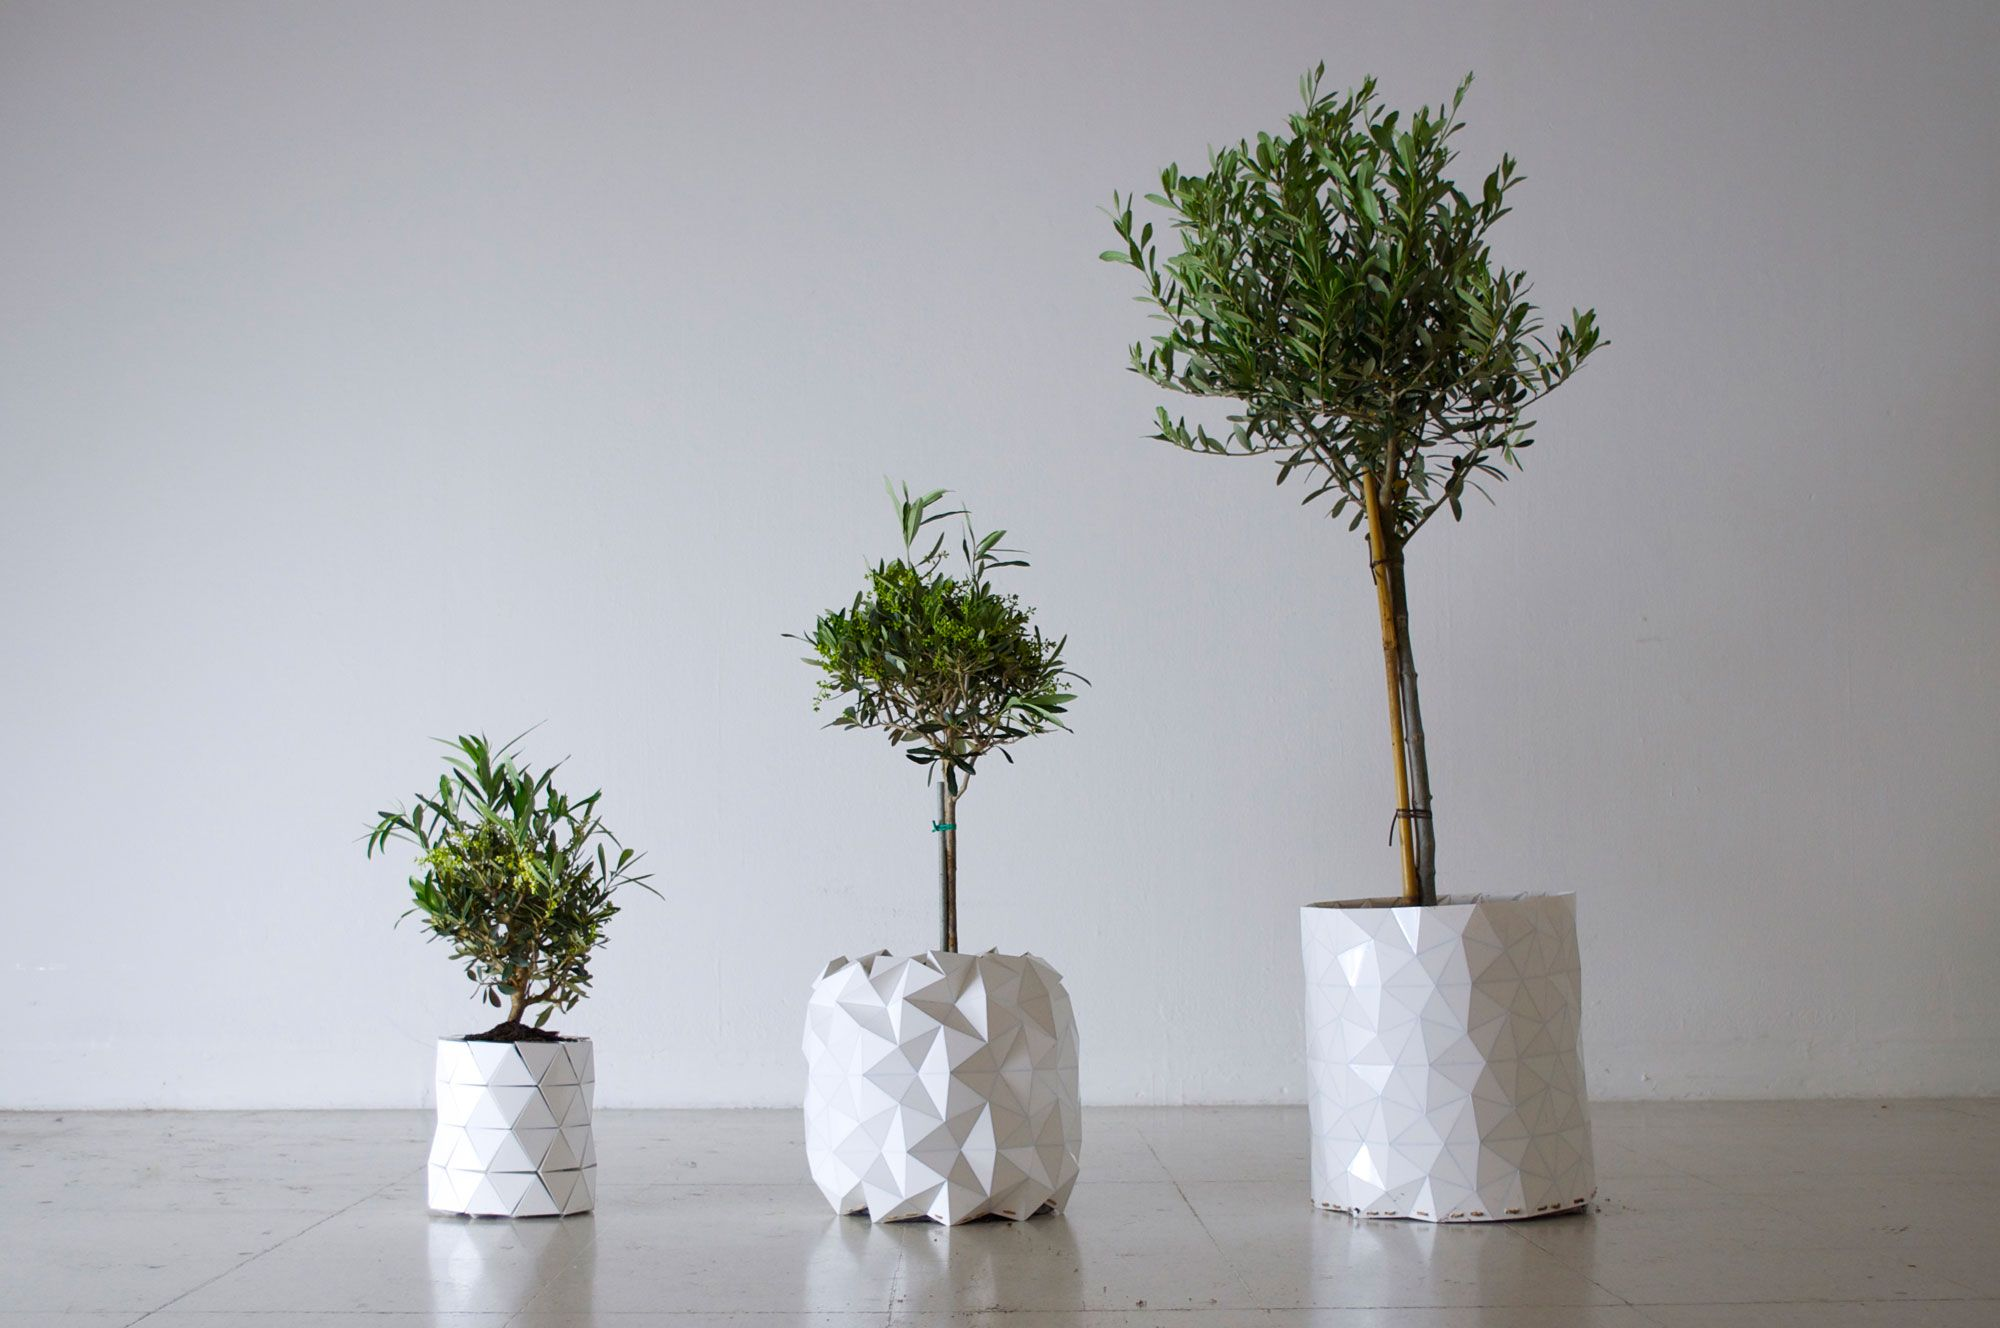 GROWTH, 식물의 성장과 함께 분갈이가 필요없이 스스로 넓어지는 놀라운 화분입니다.   기계적인 것도 아니고, 특별한 재료가 사용된 것도 아닙니다. 이런 기능이 가능한 이유는 화분자체에 '종이접기'의 원리가 적용